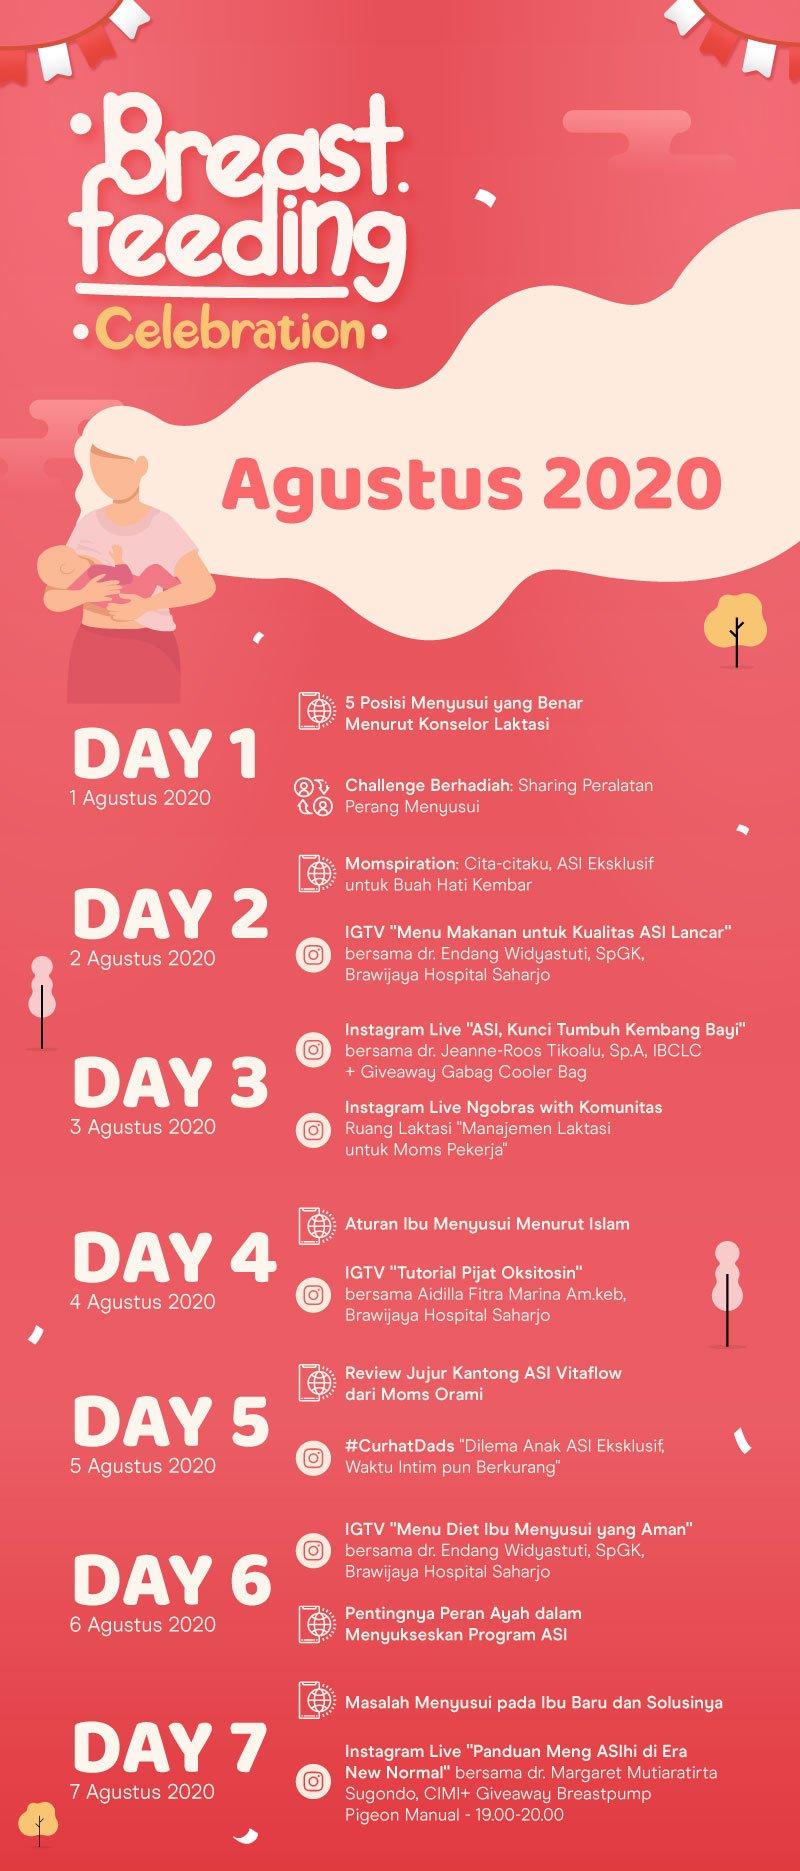 orami breastfeeding week celebration